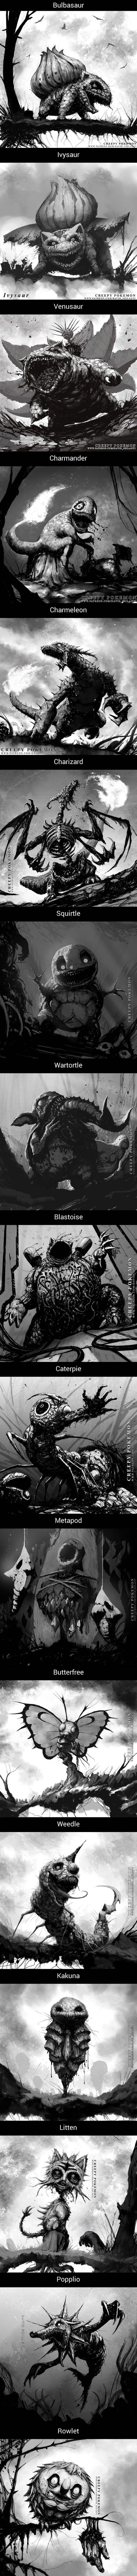 Creepy Pokemon by Artist David Szilagyi Pokémon, scary, dark, illustration